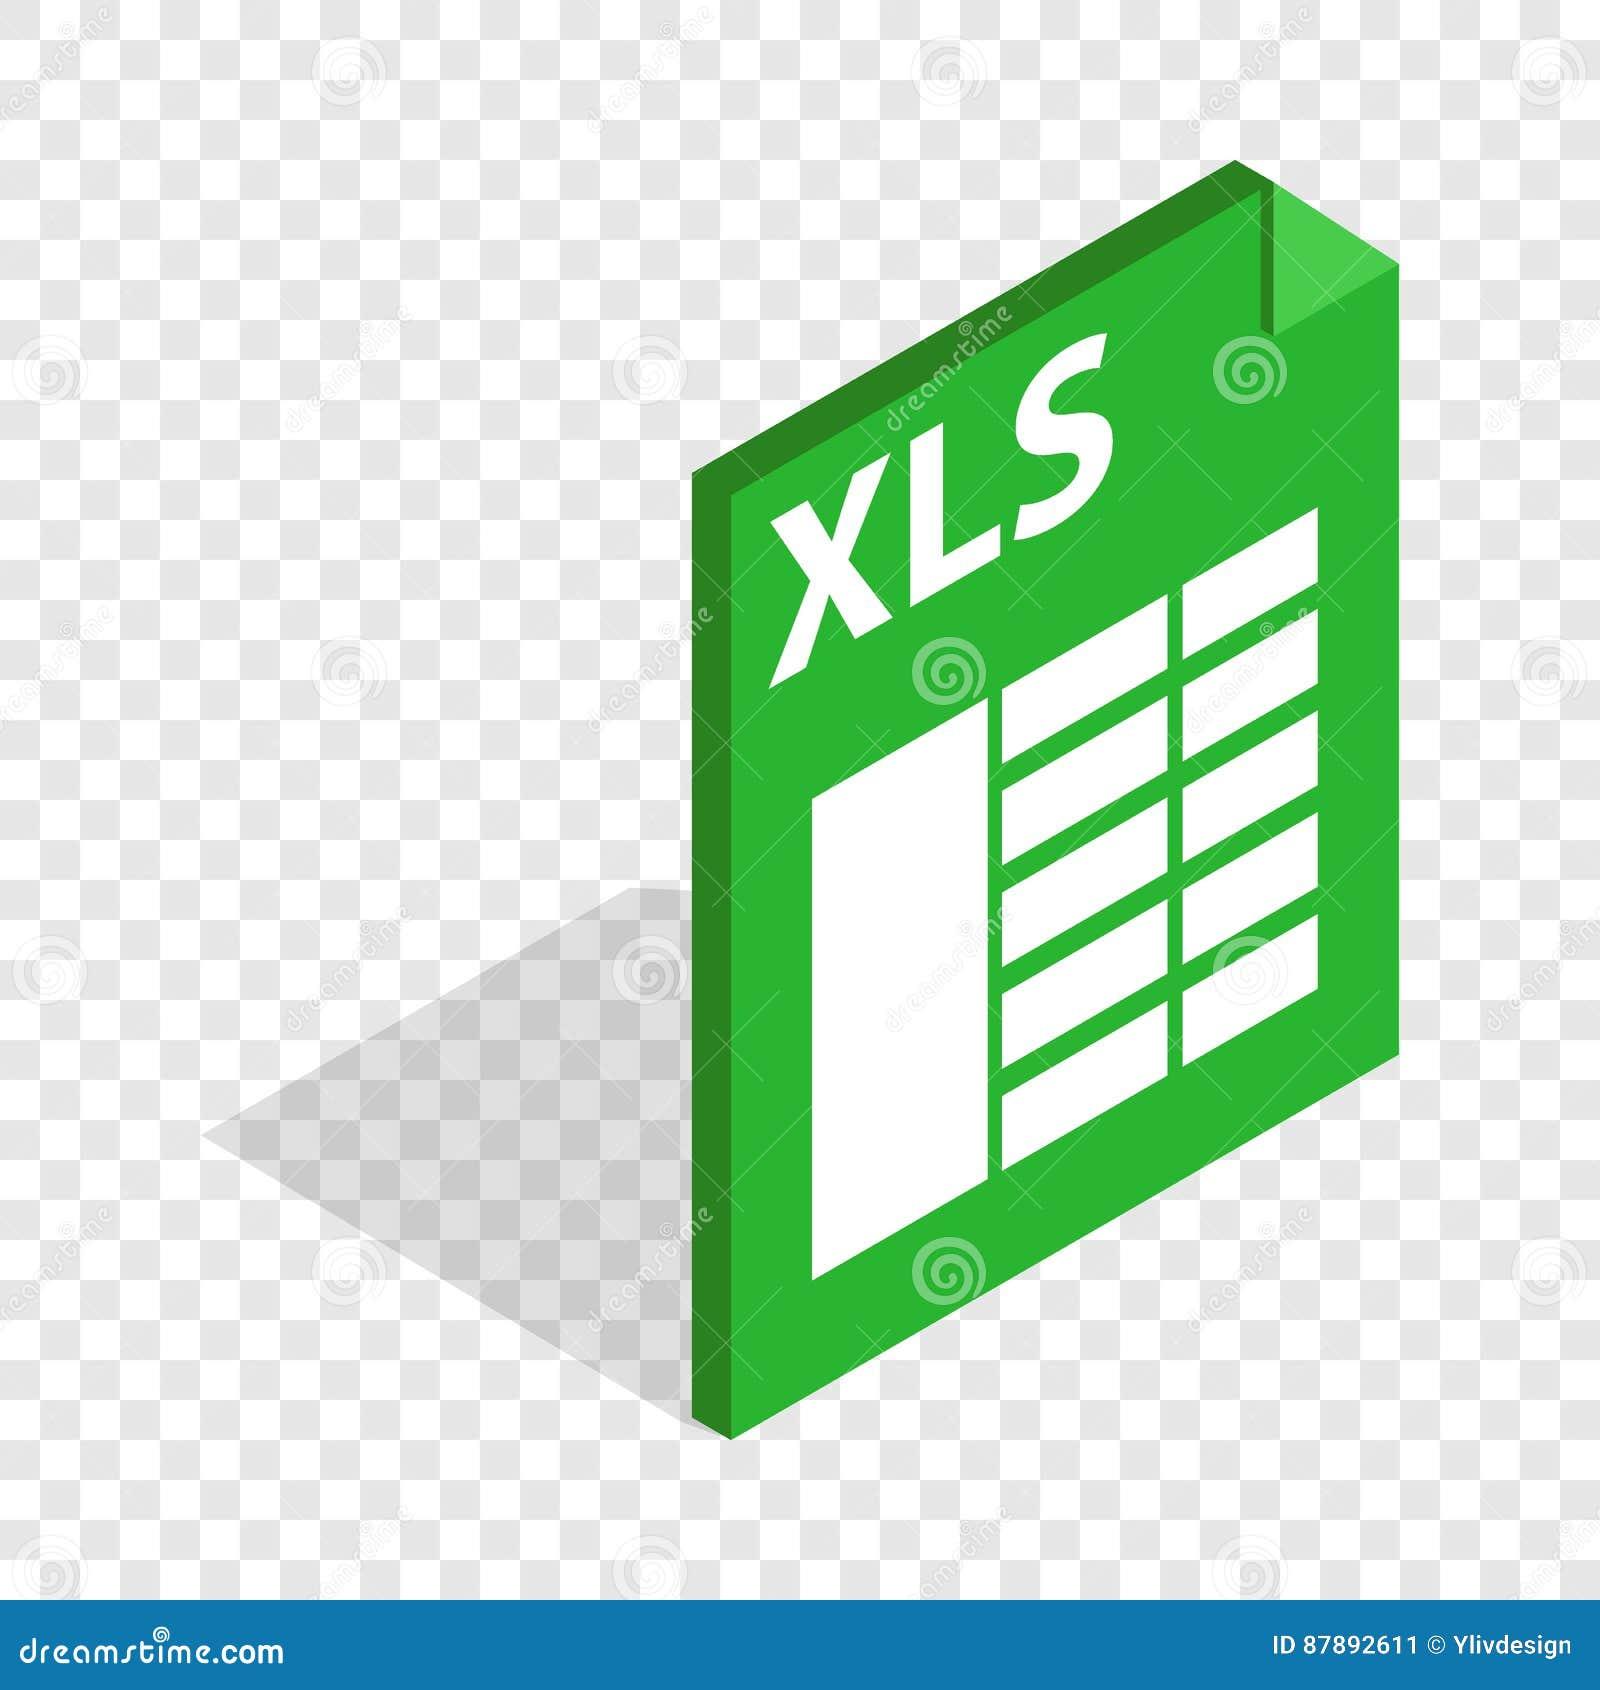 File Format Xls Isometric Icon Stock Vector - Illustration